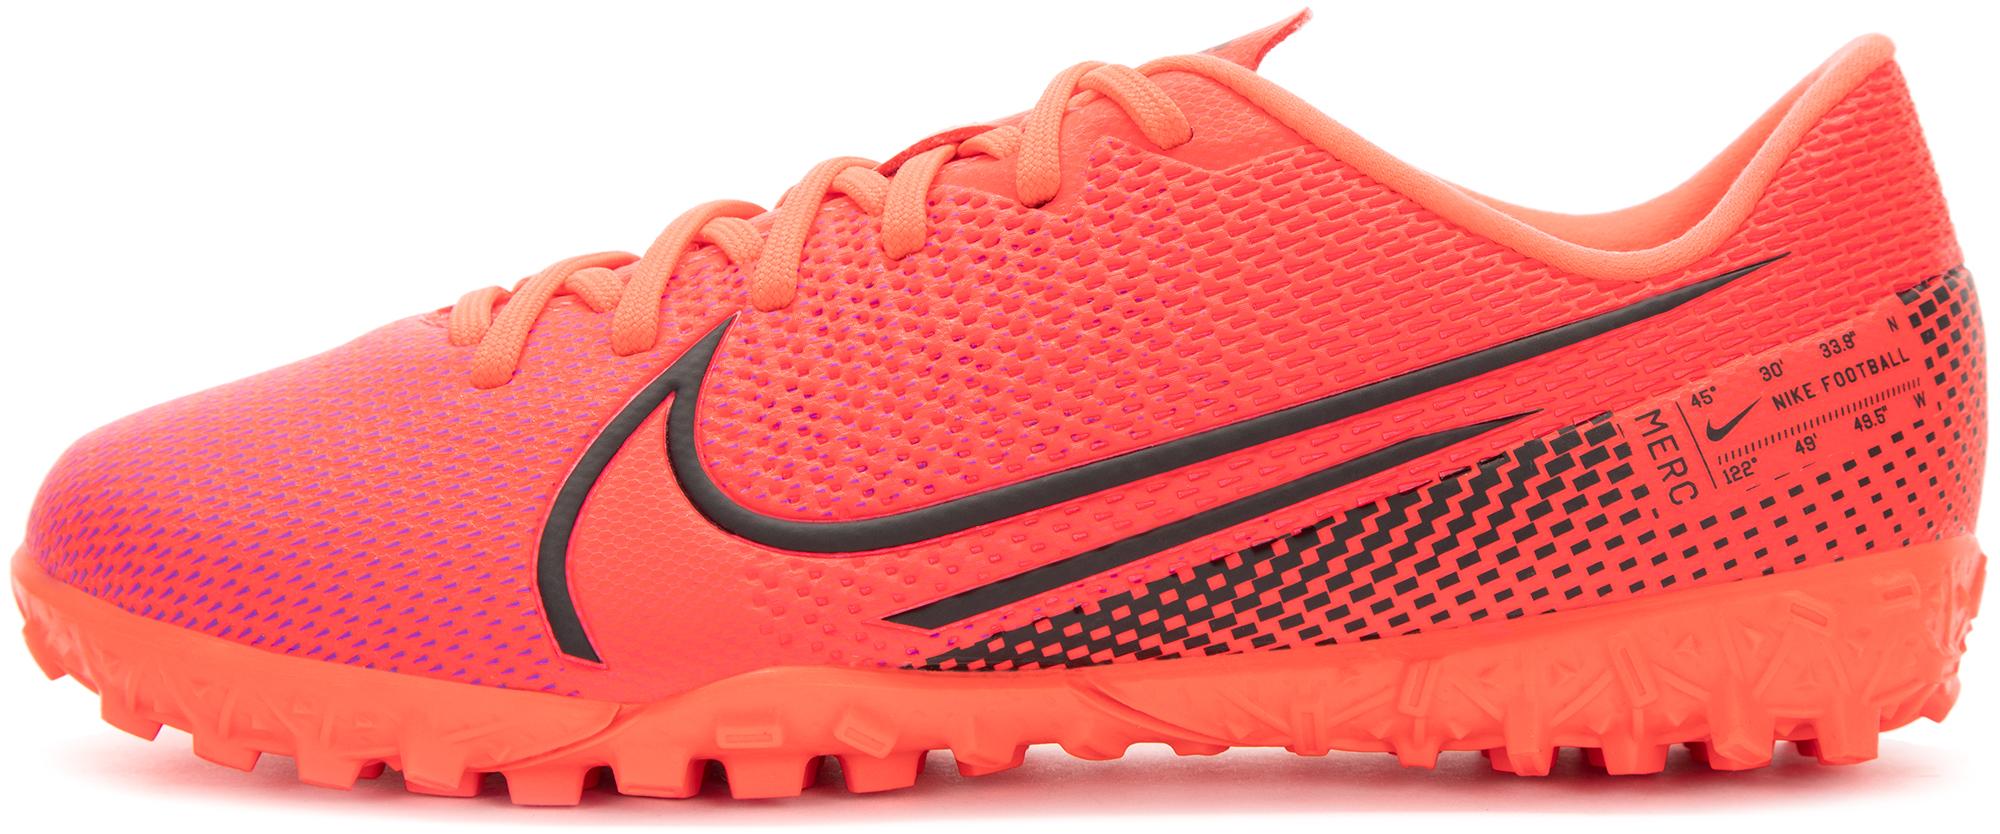 цена на Nike Бутсы для мальчиков Nike Jr Vapor 13 Academy TF, размер 35.5